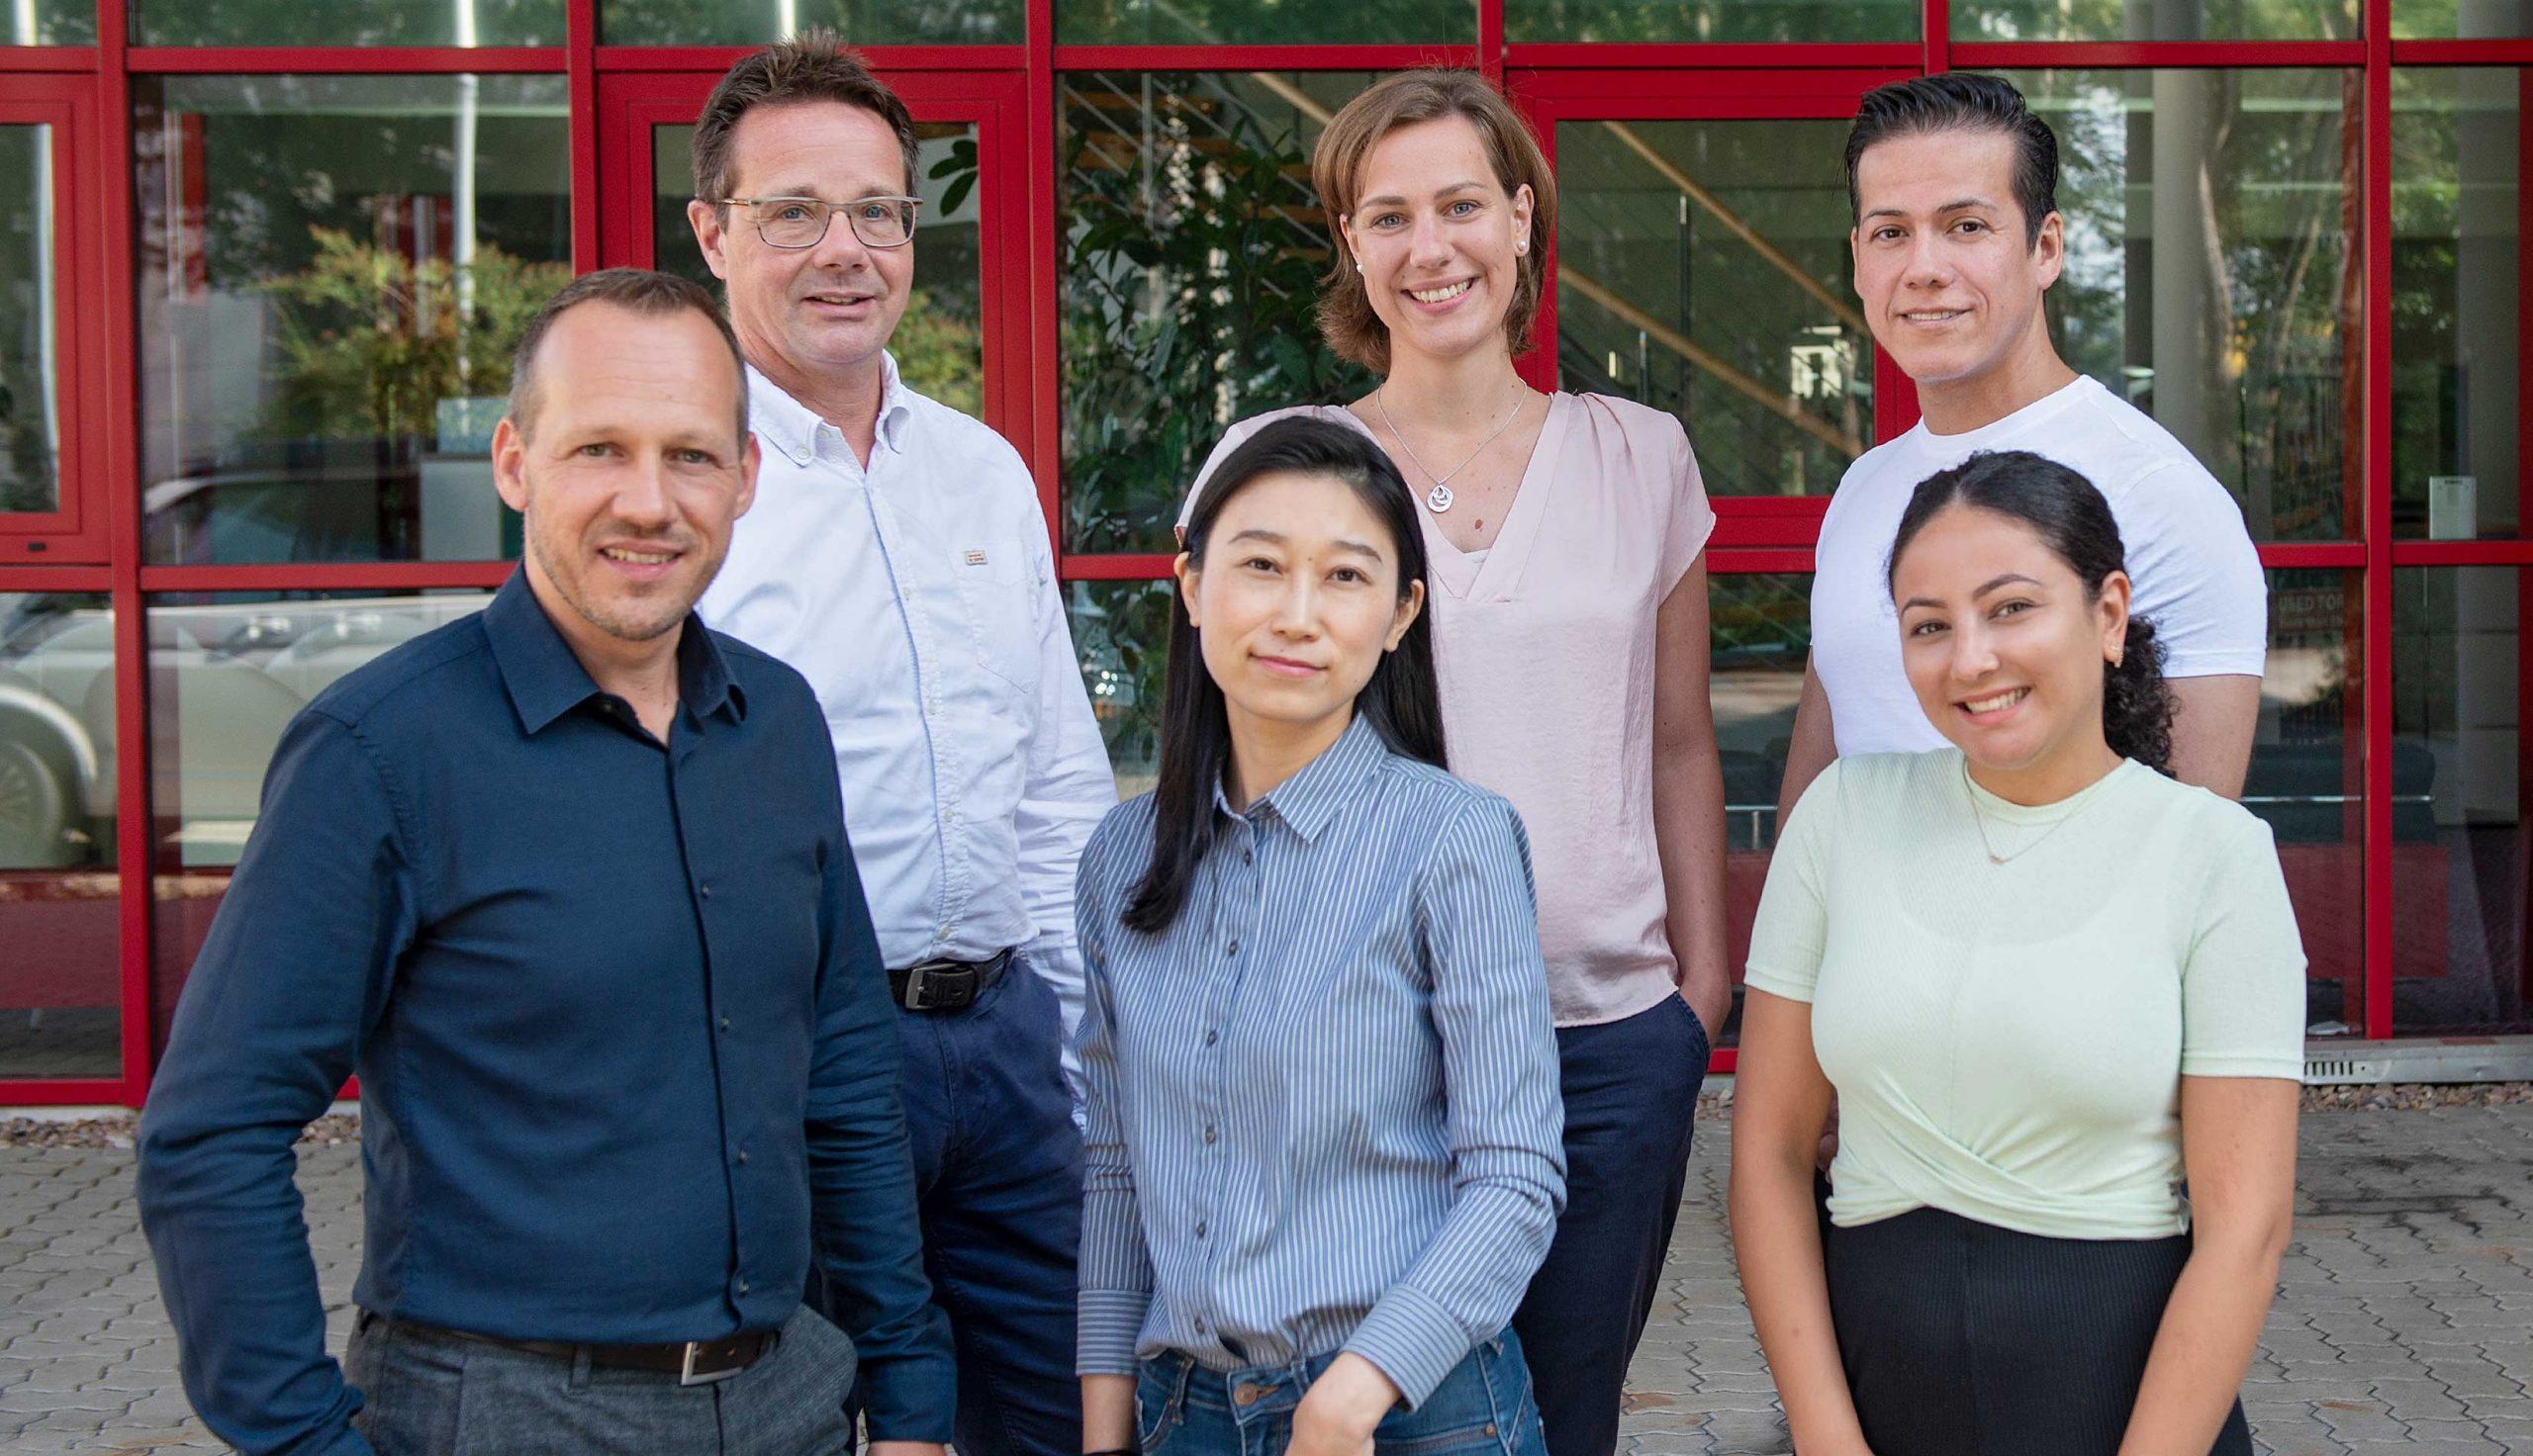 TRAFIK Bremen - 的可靠性,质量和专业性